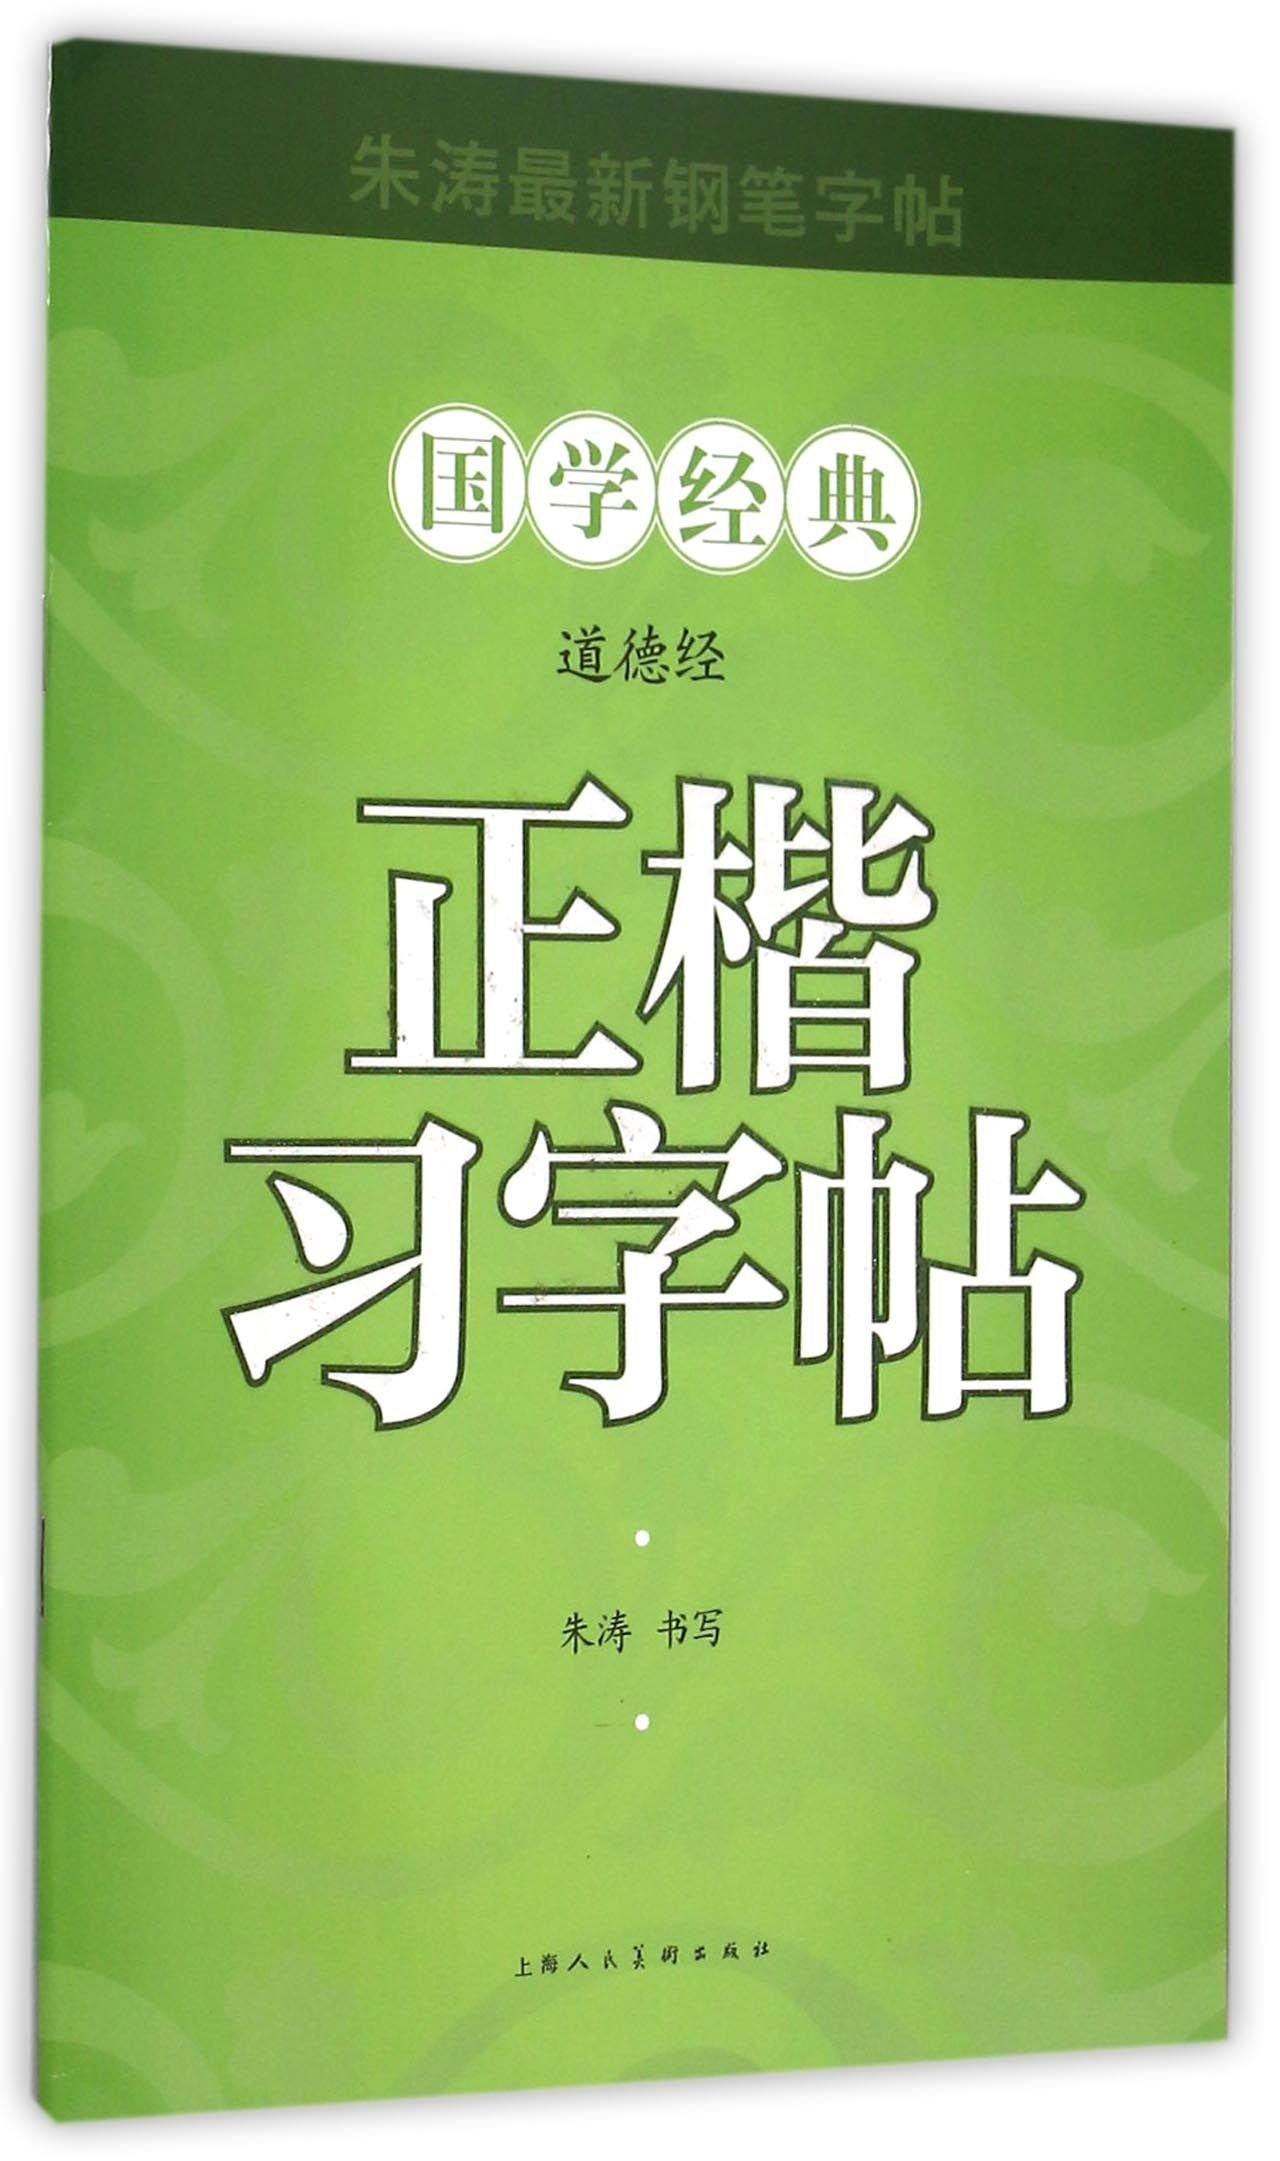 Download Regular Script Copybook: Tao Te Ching (Chinese Edition) PDF ePub ebook